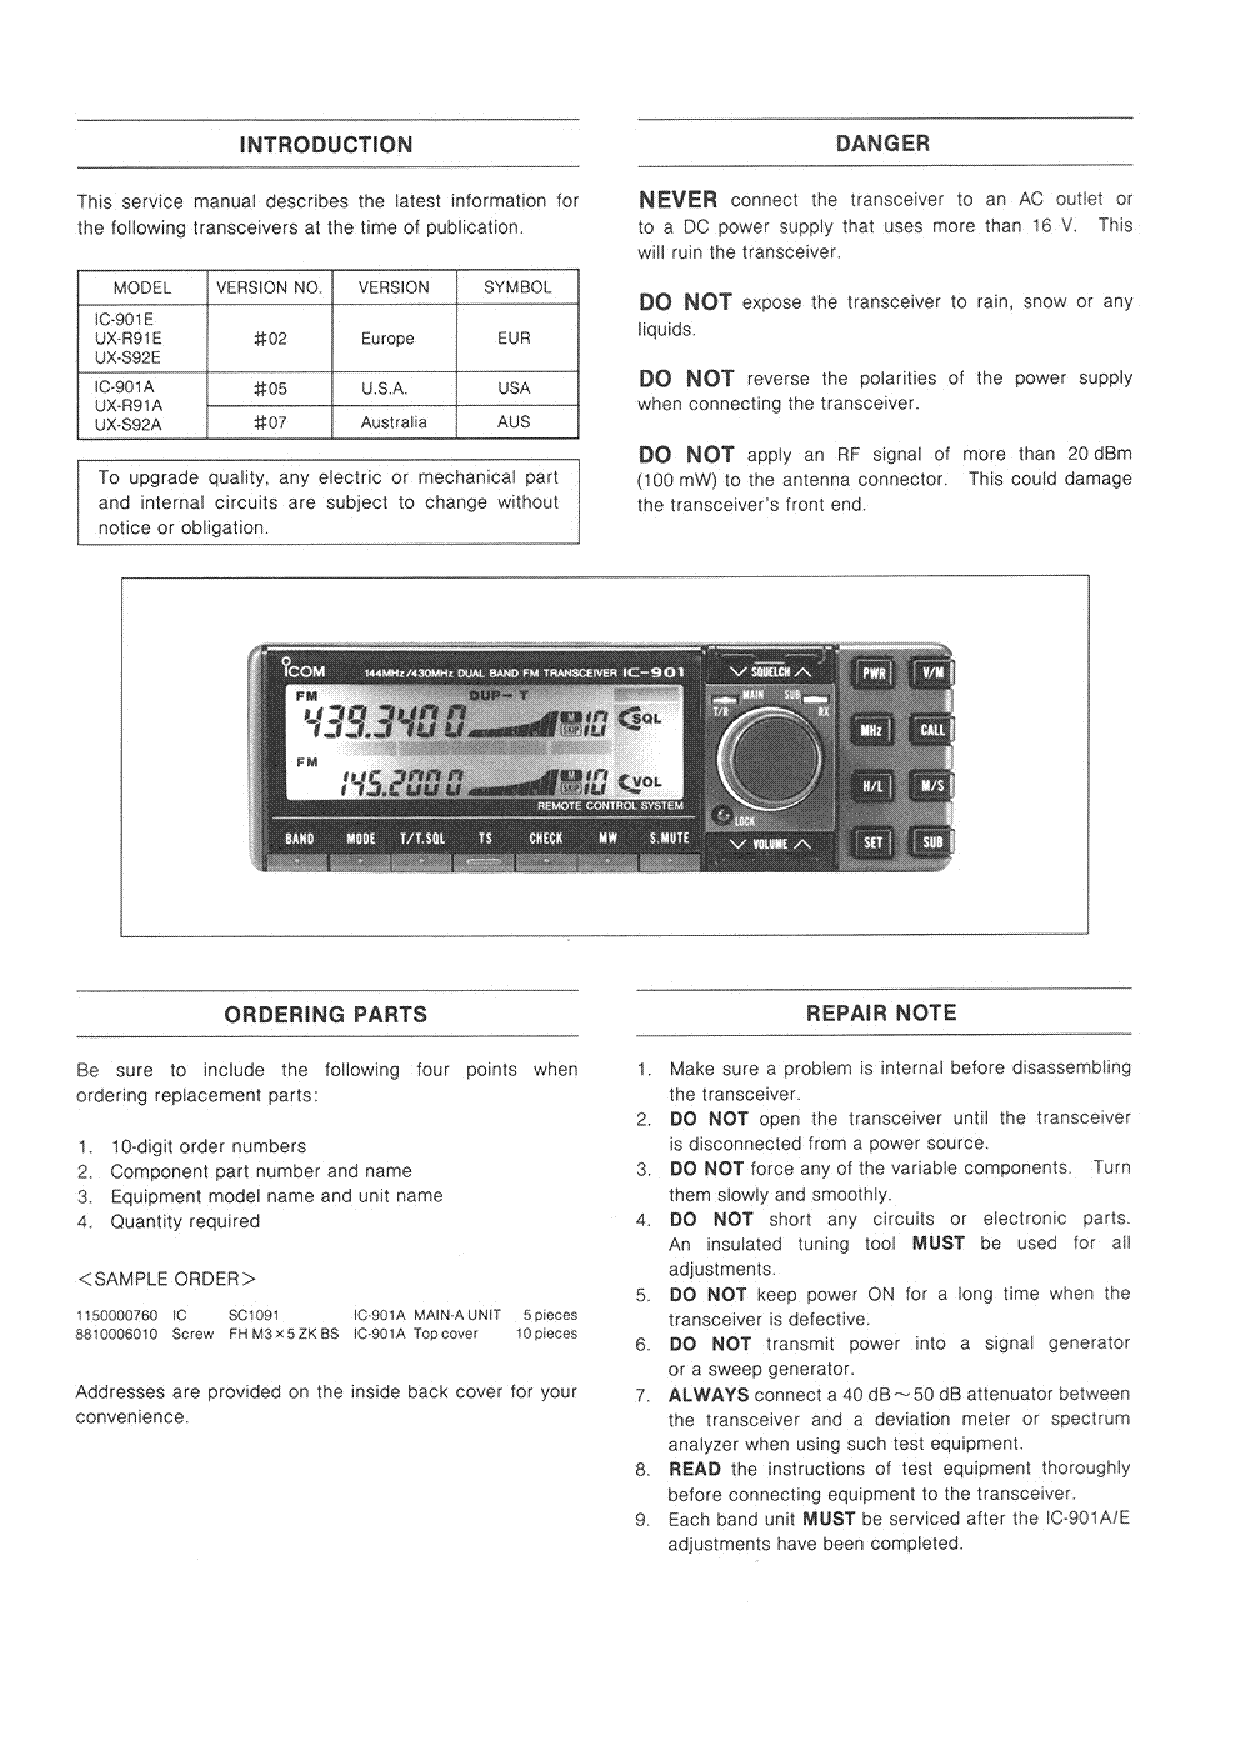 ICOM IC-901A, 901E SERVICE MANAUL Service Manual download